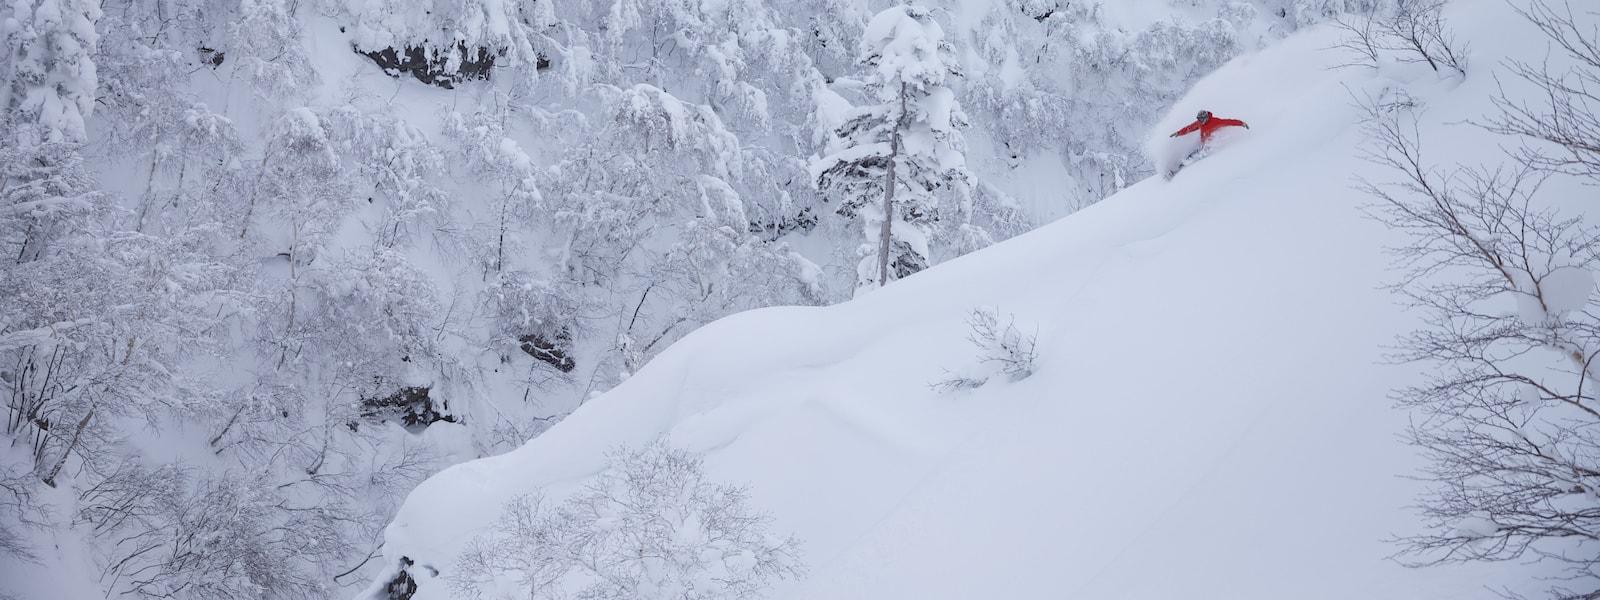 hakuba snowboarding (p.c. @Welsh)